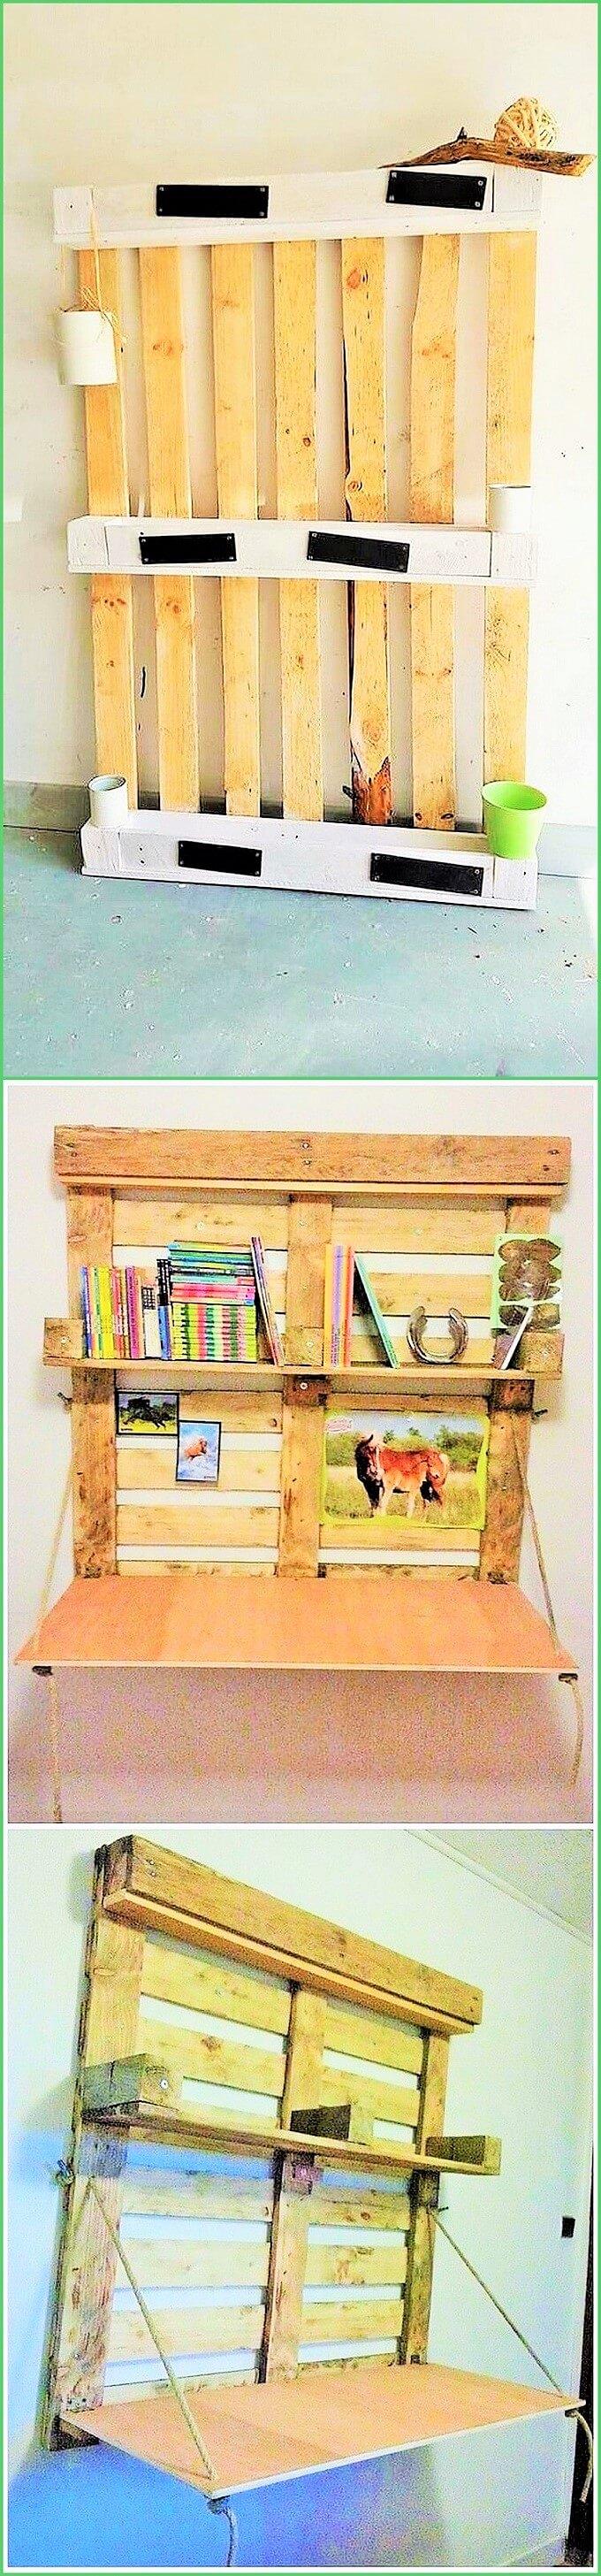 Wooden-Pallet-project-diy-ideas-1 (3)